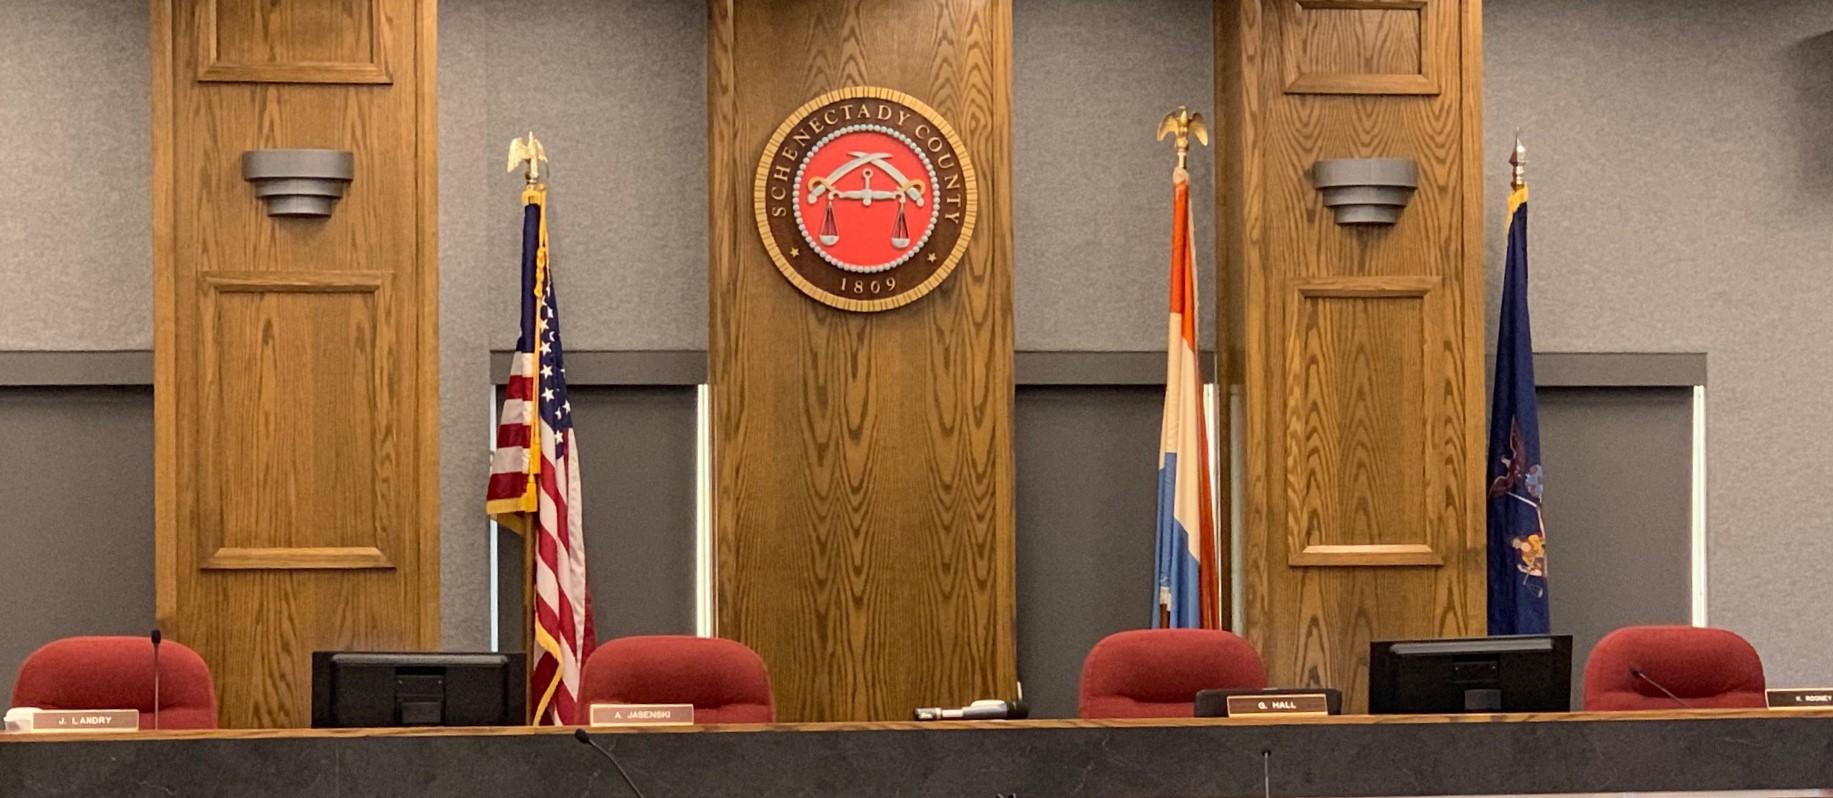 County leg meeting room cropped.jpg